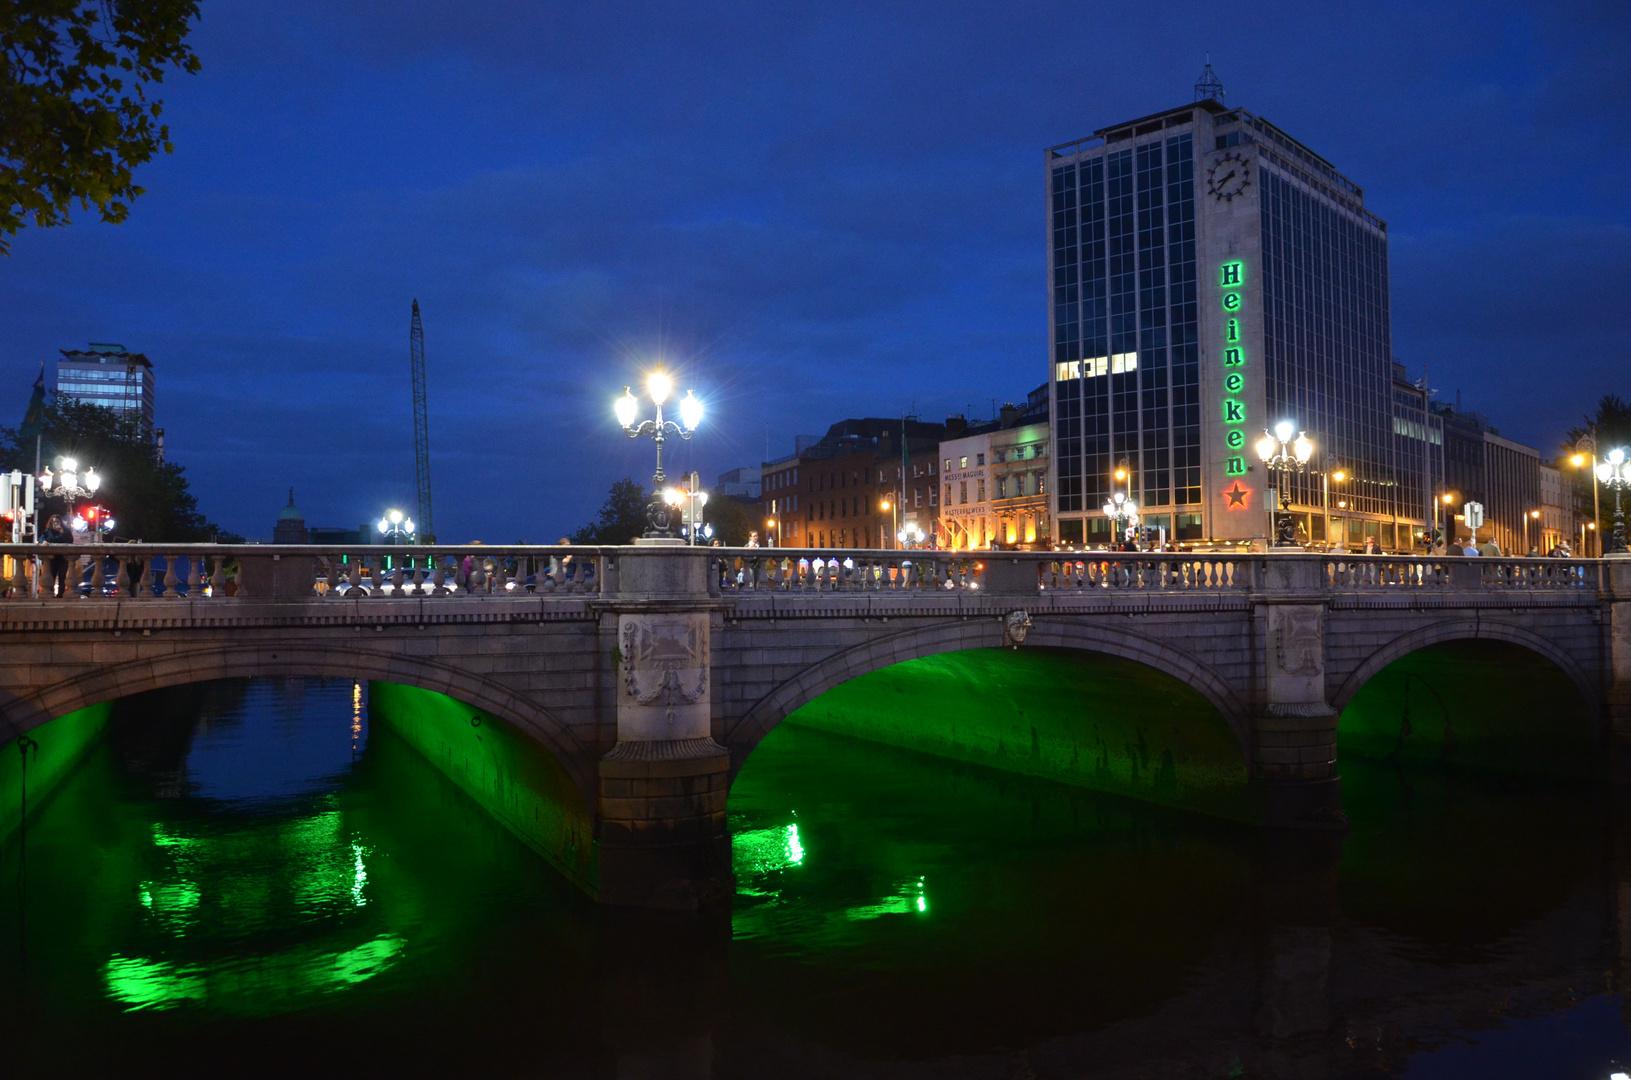 O'Connell Bridge by Night - Dublin - Ireland